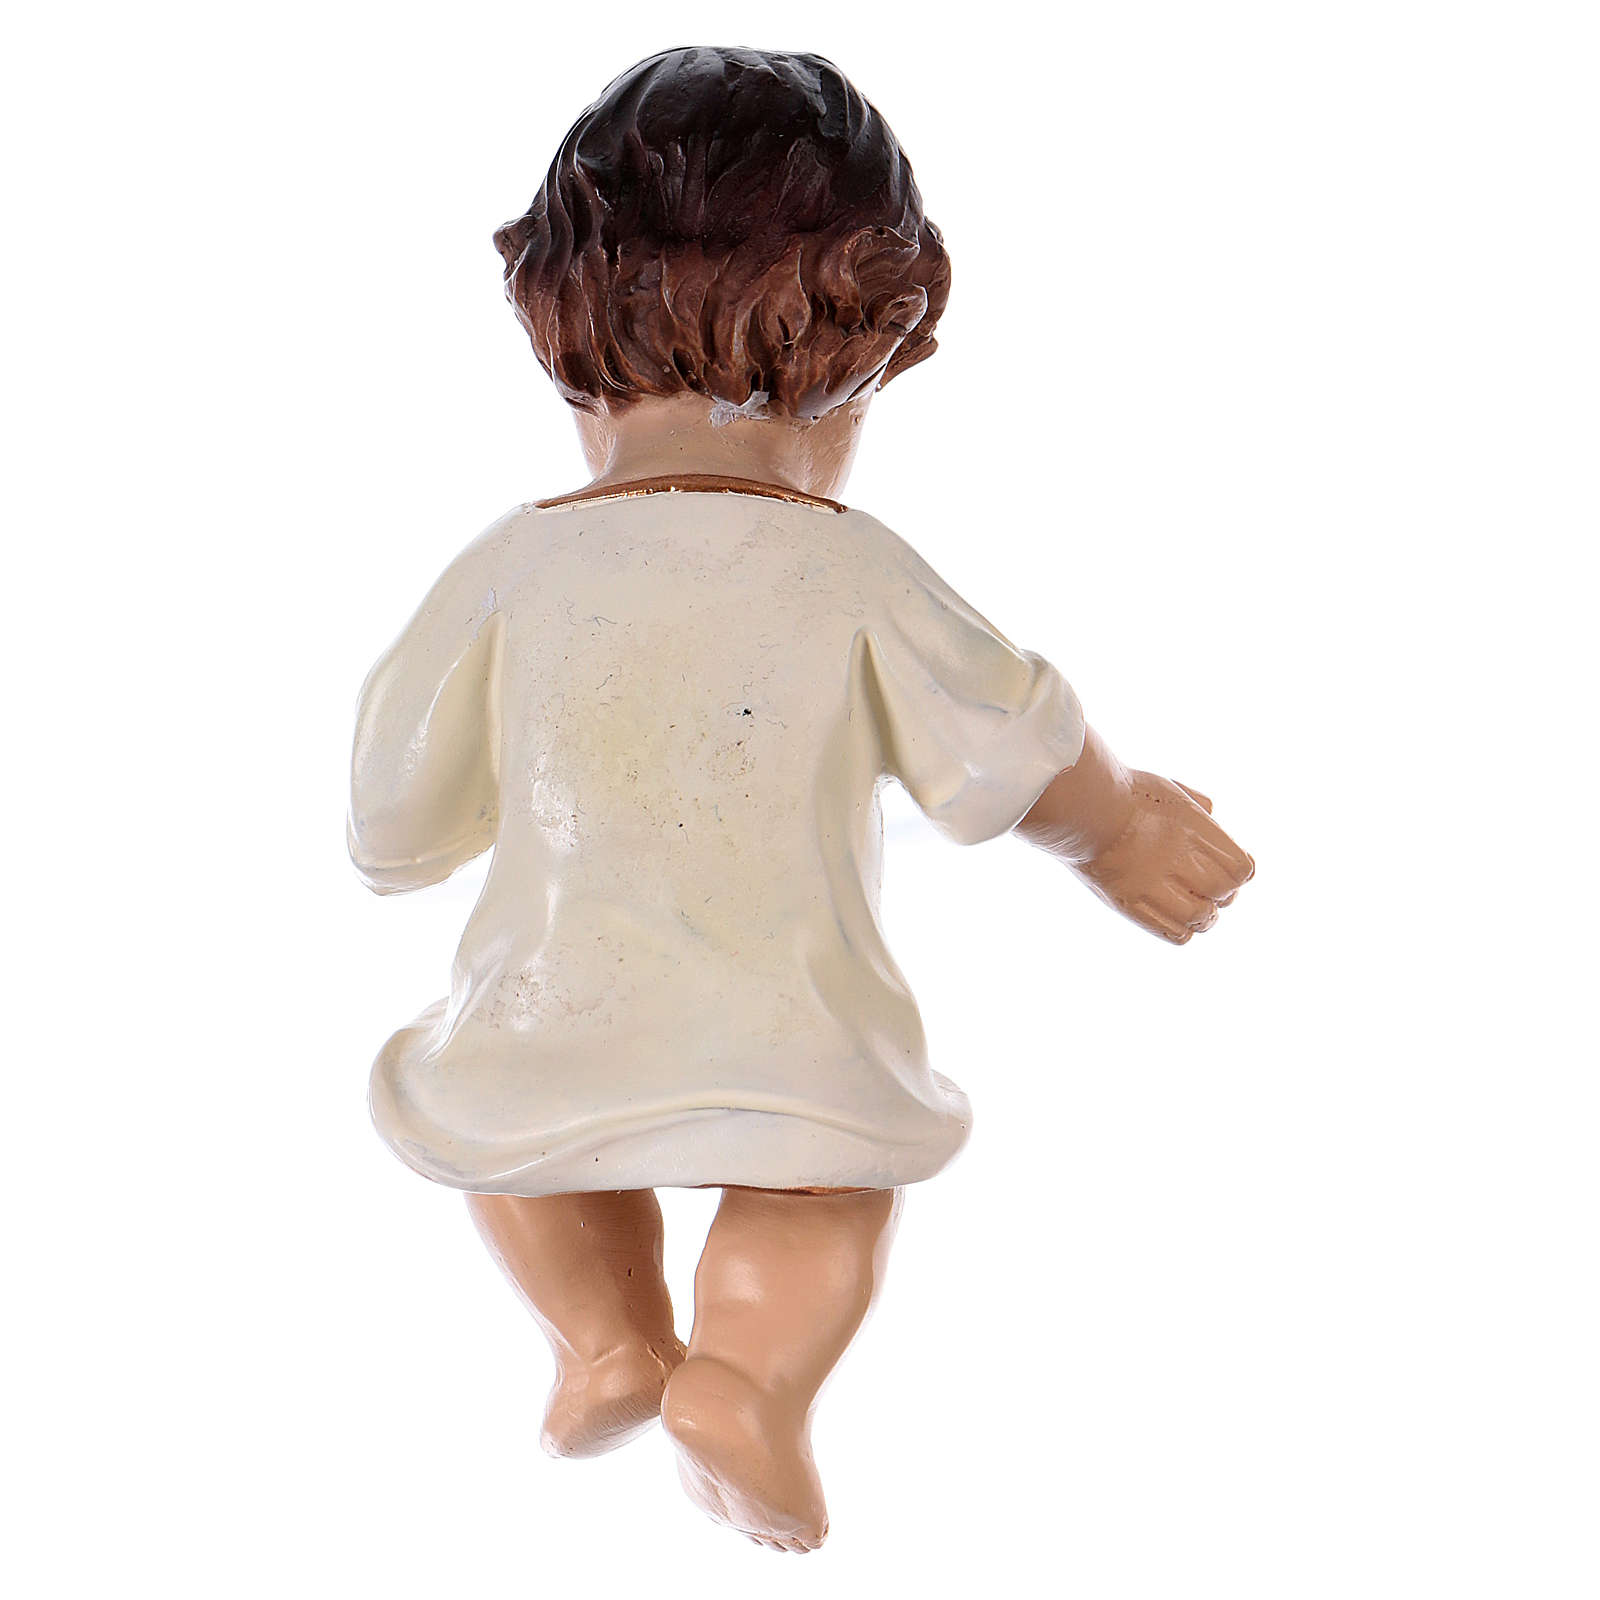 Bambinello veste bianca h reale 10,5 cm resina 3